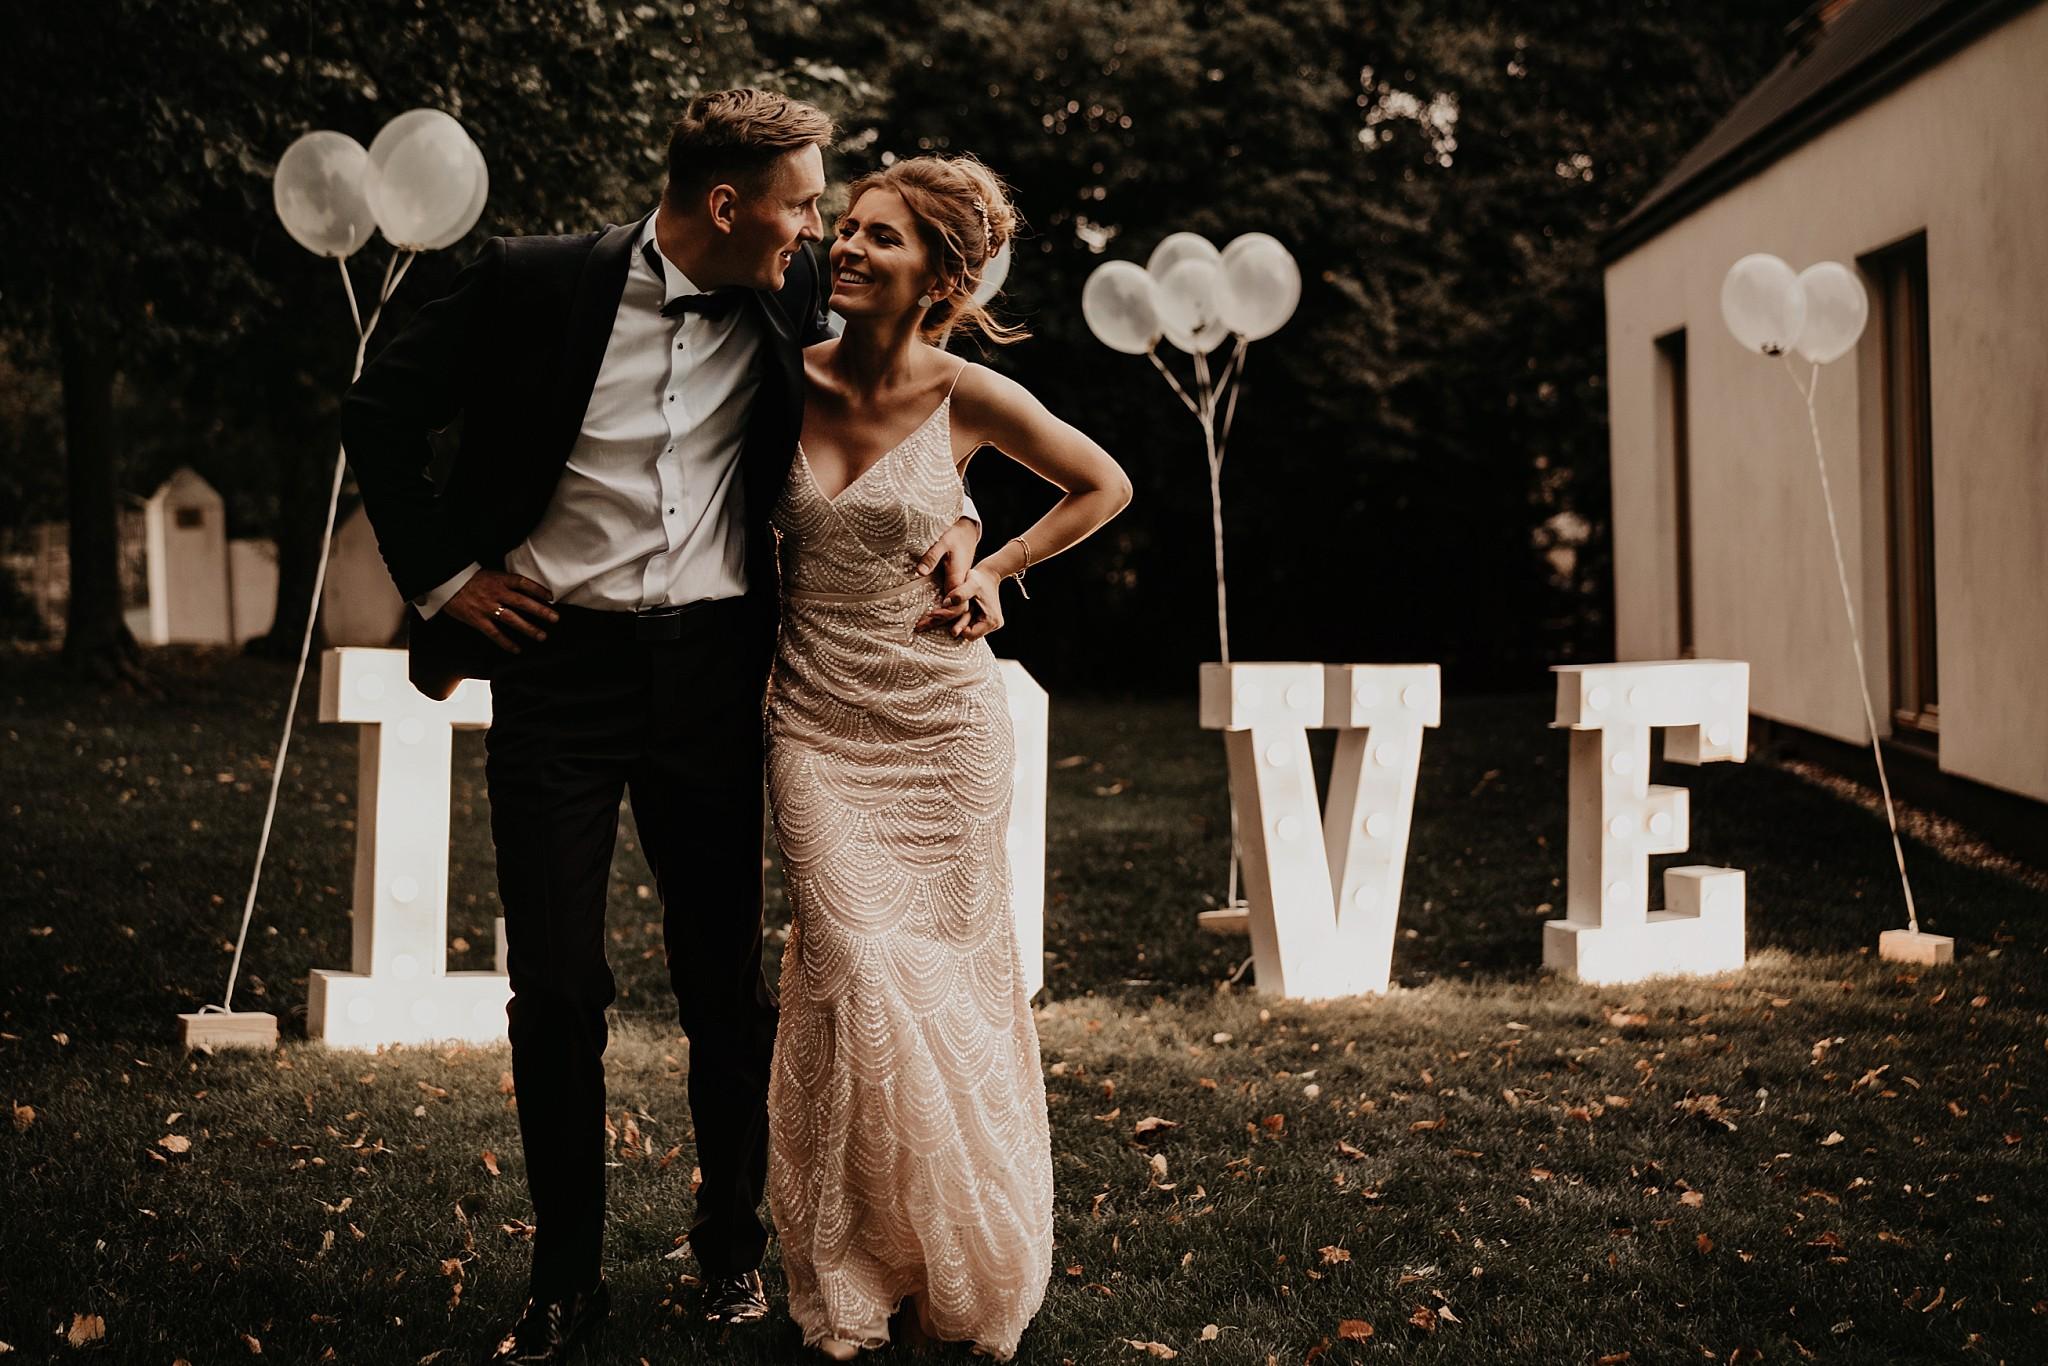 fotograf poznan wesele dobra truskawka piekne wesele pod poznaniem wesele w dobrej truskawce piekna para mloda slub marzen slub koronawirus slub listopad wesele koronawirus 353